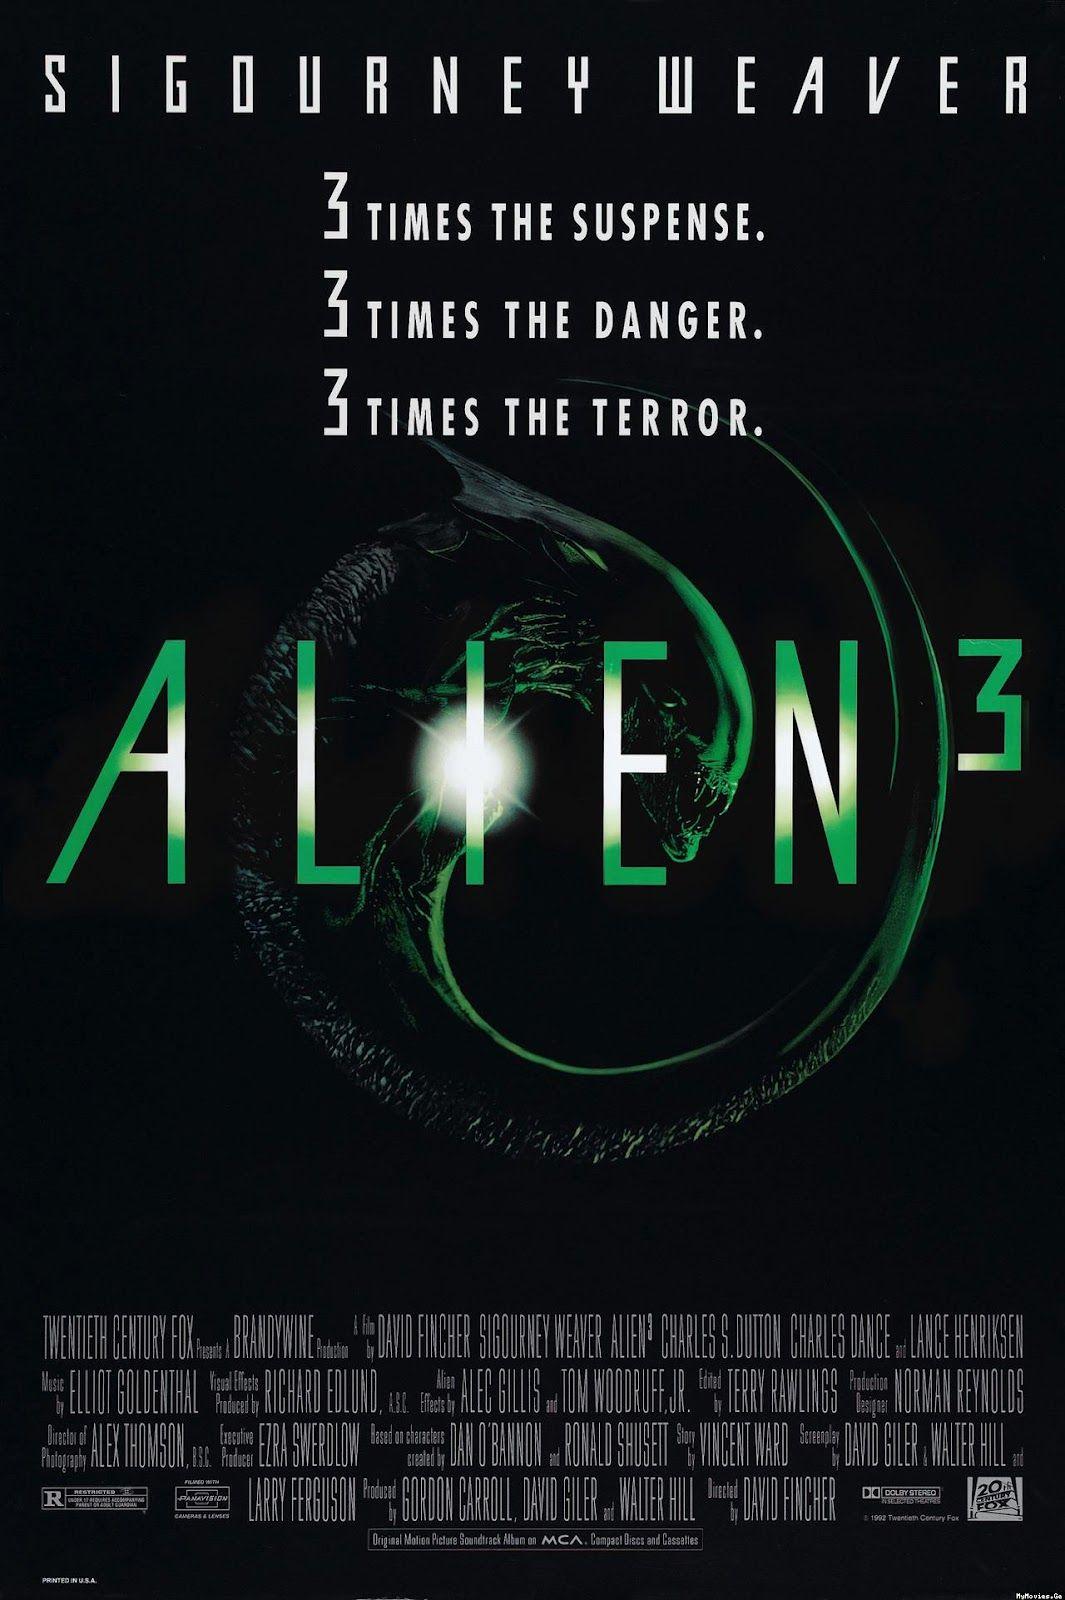 Alien 3 Premiered 22 May 1992